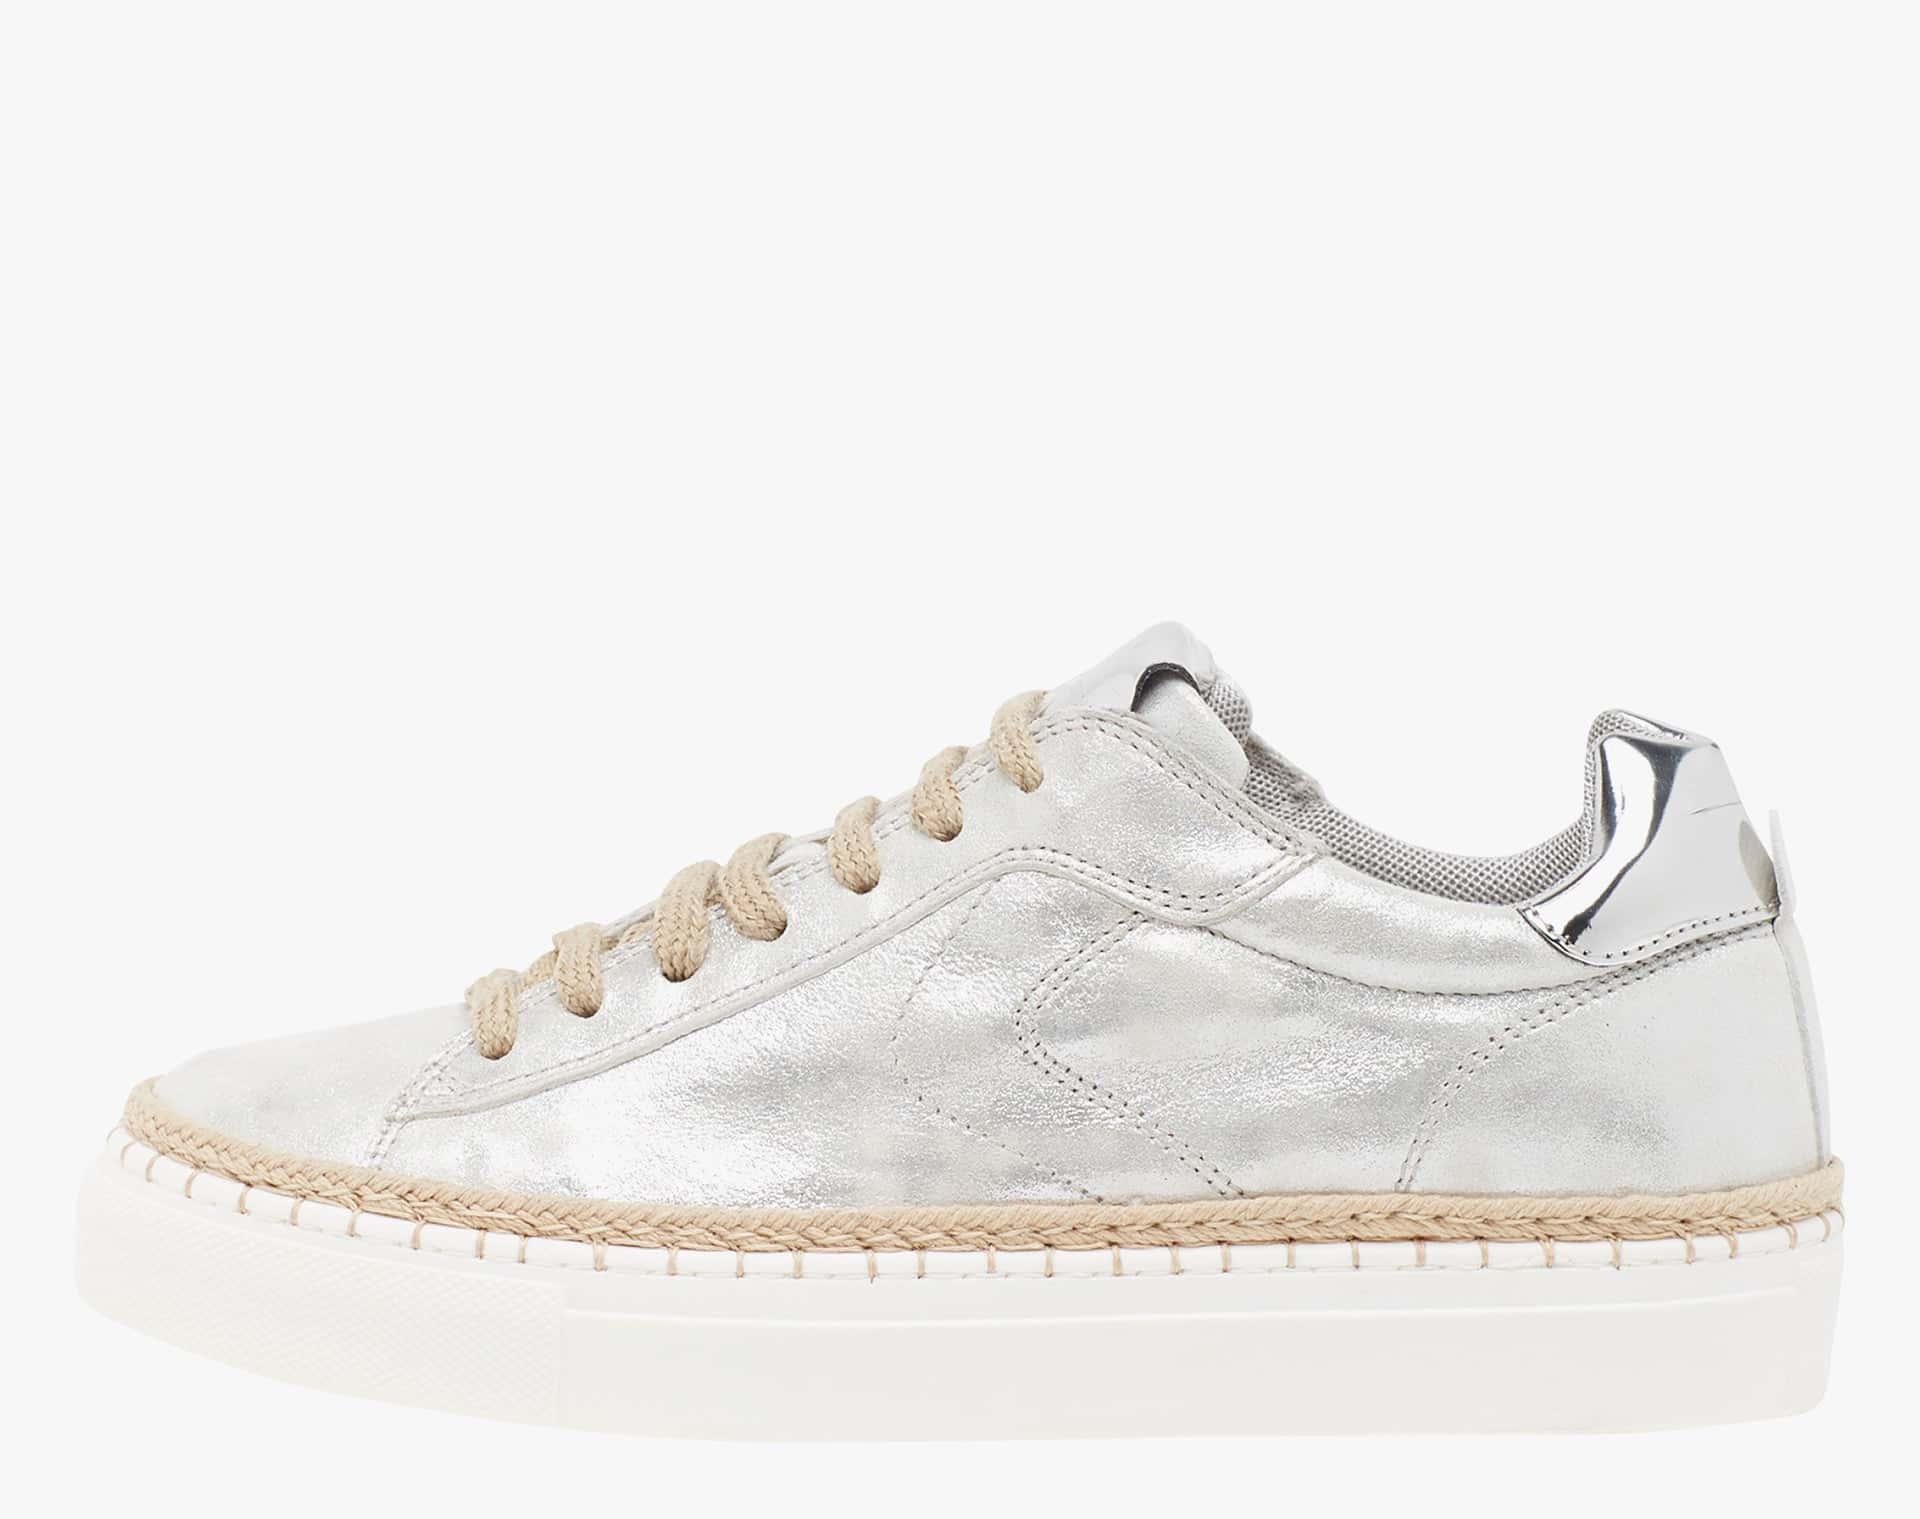 PANAREA - Sneaker in pelle laminata e dettagli in juta - Argento